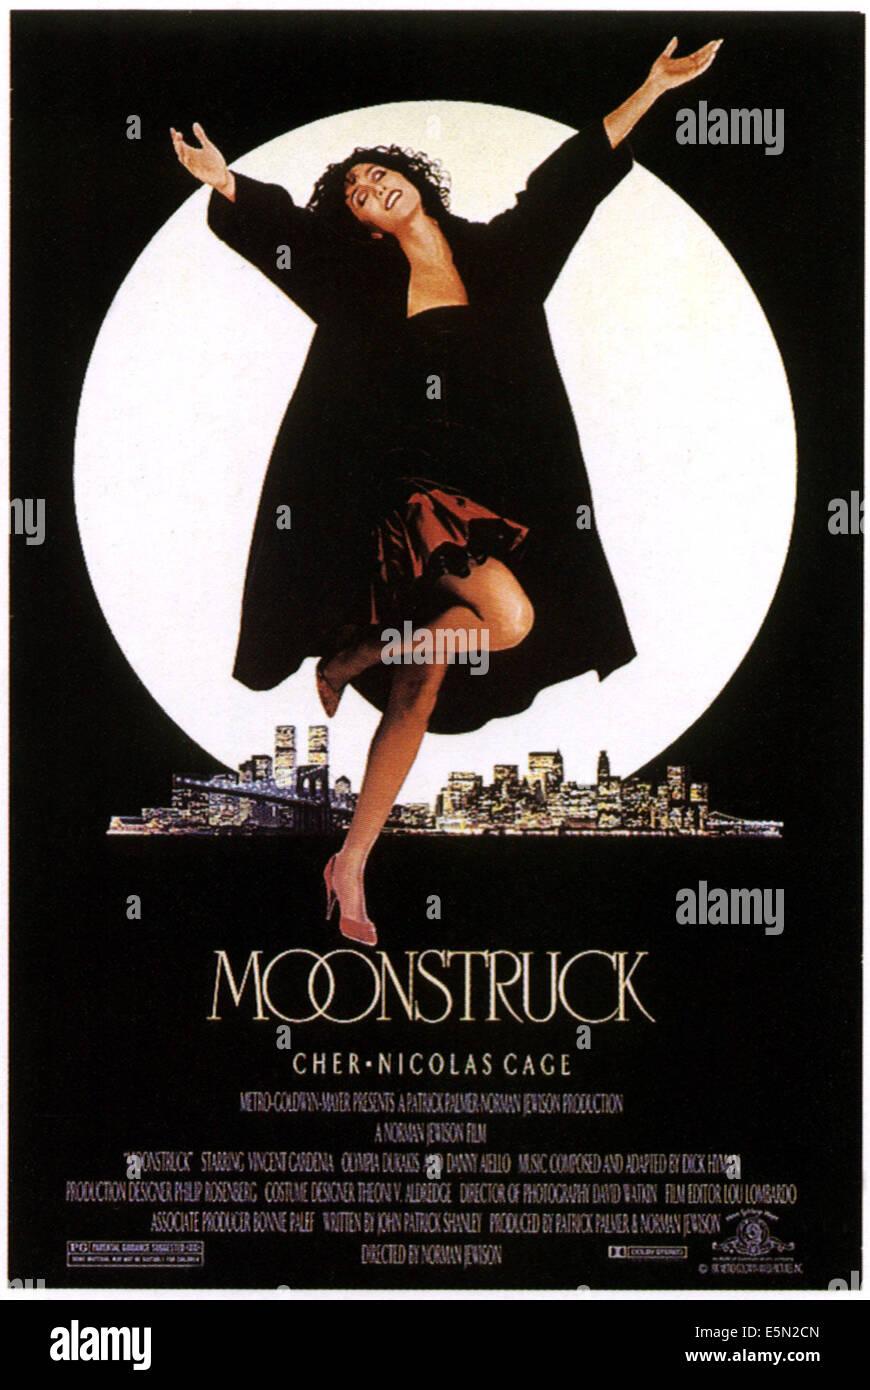 MOONSTRUCK, Cher, 1987 - Stock Image